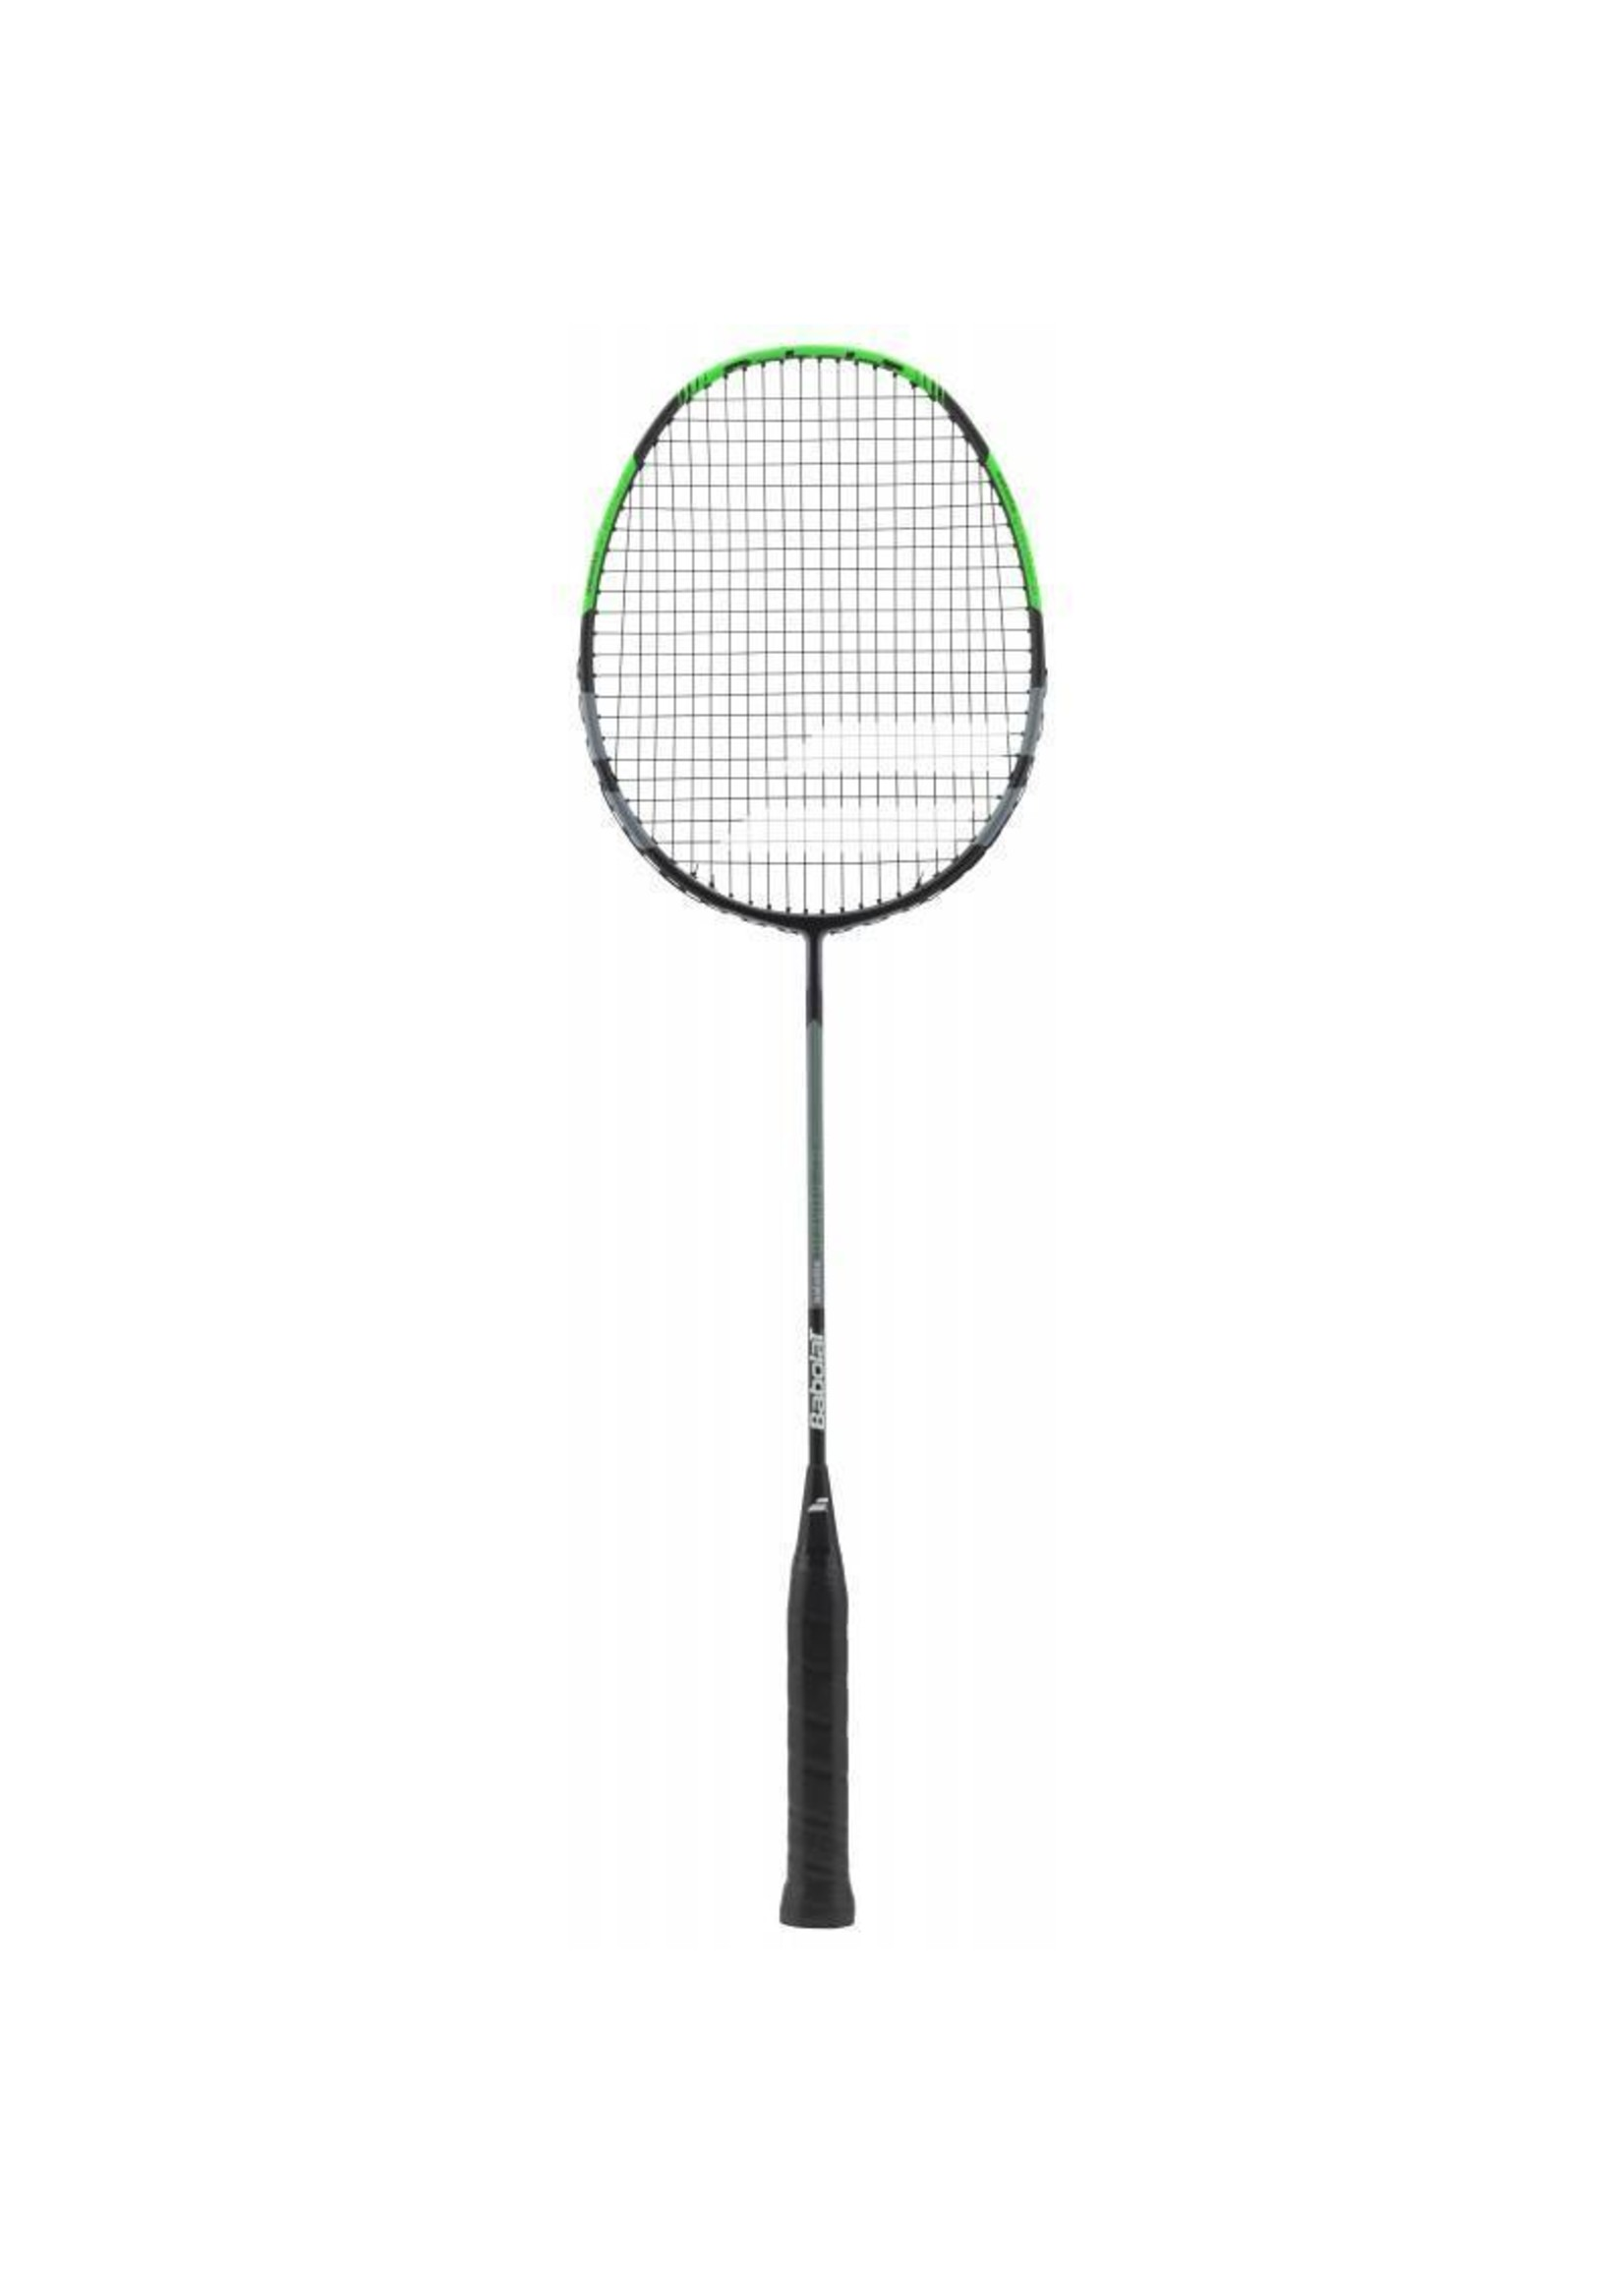 Babolat Babolat Satelite Gravity 78 Badminton Racket, Green (2017)